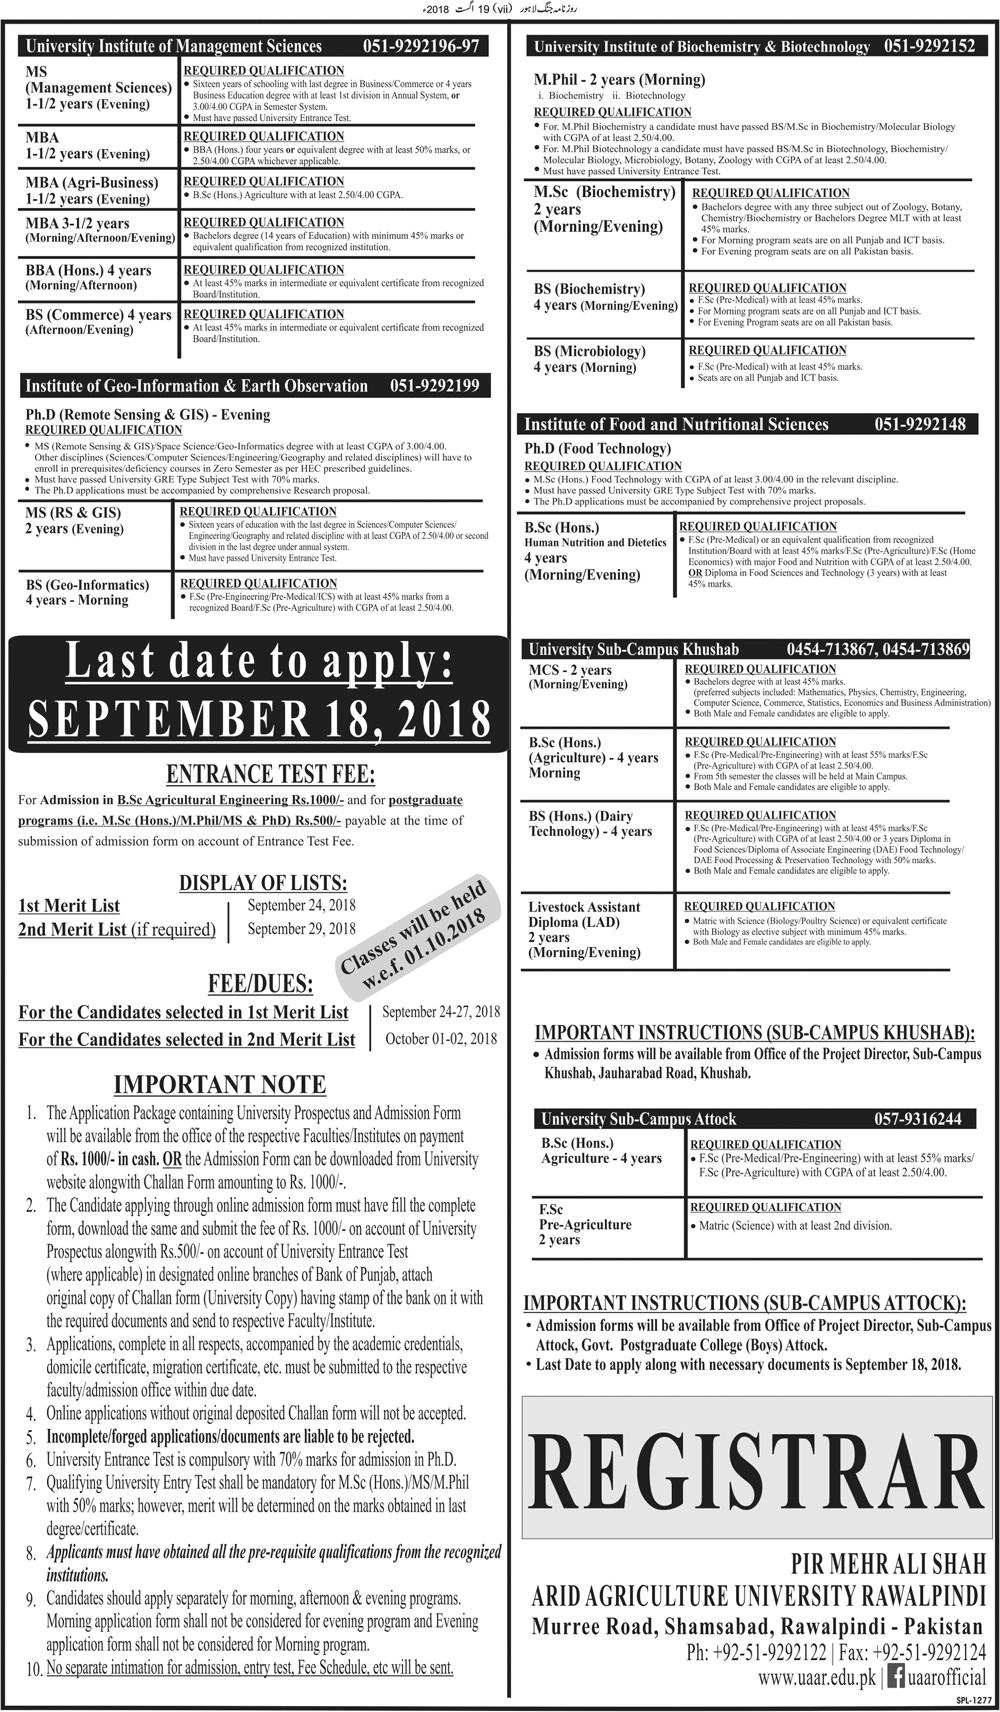 Arid Agriculture University Rawalpindi Admission Fall 2018 Last Date